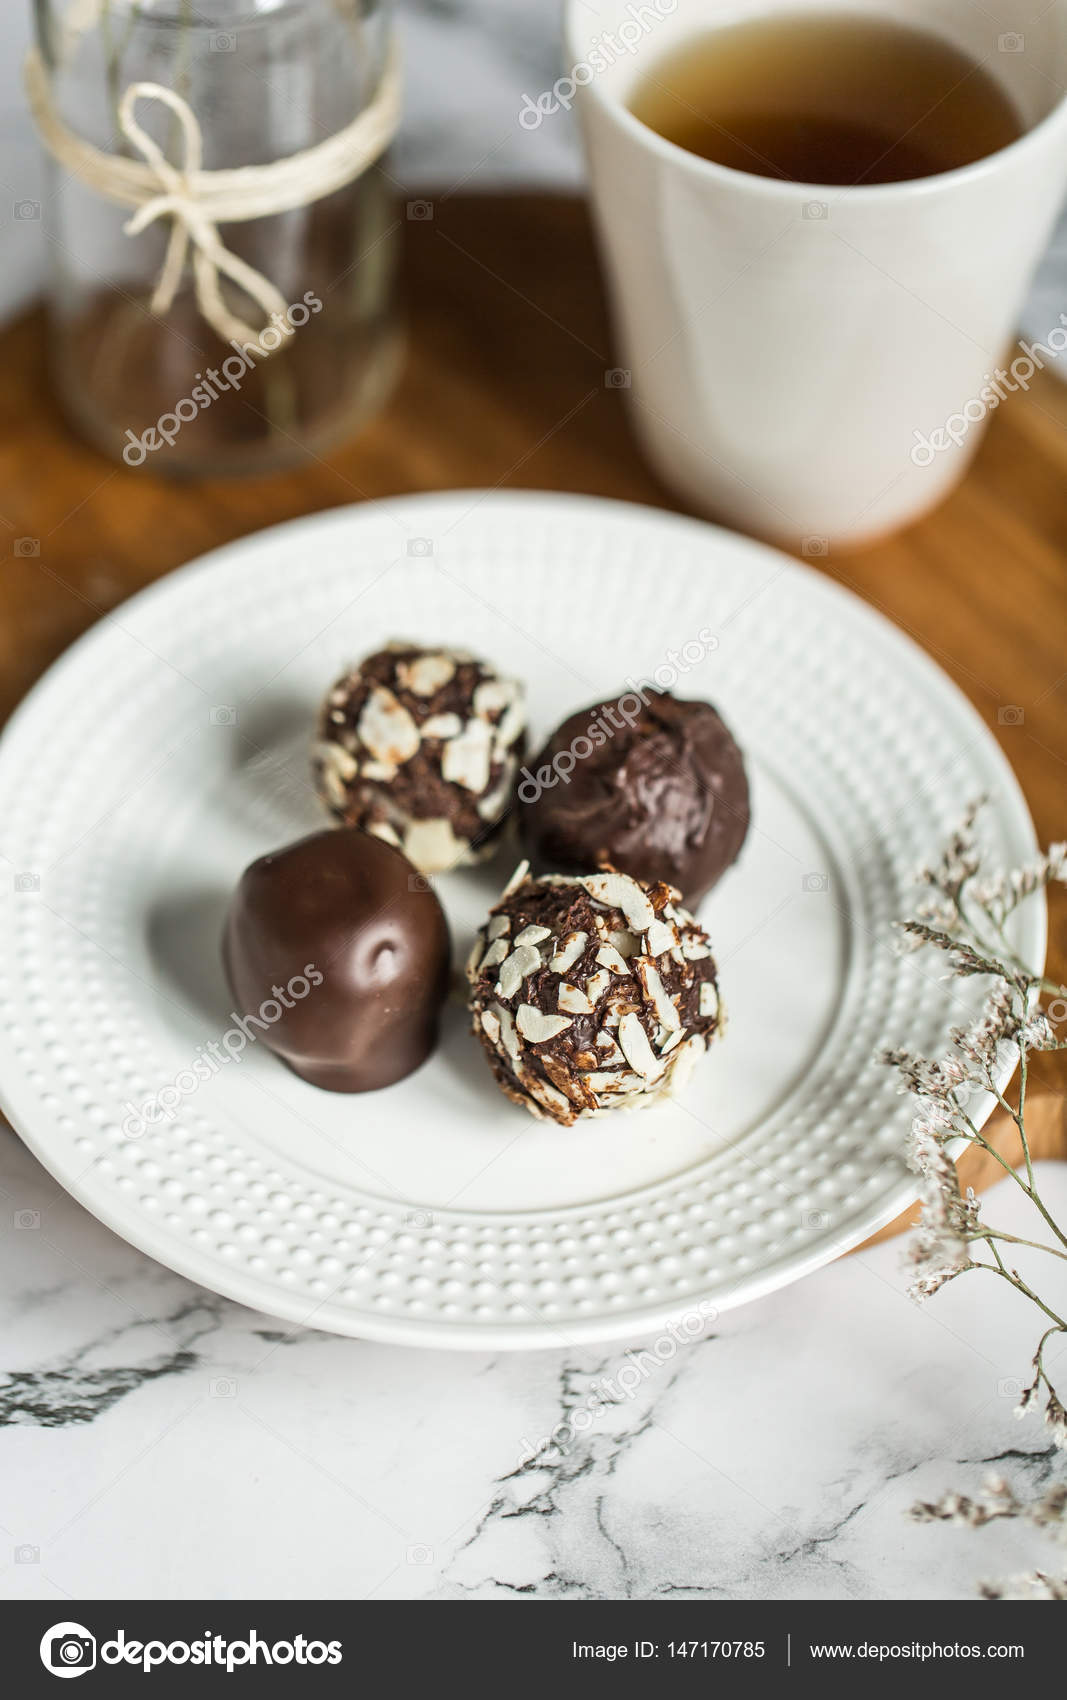 How is chocolate useful? 3